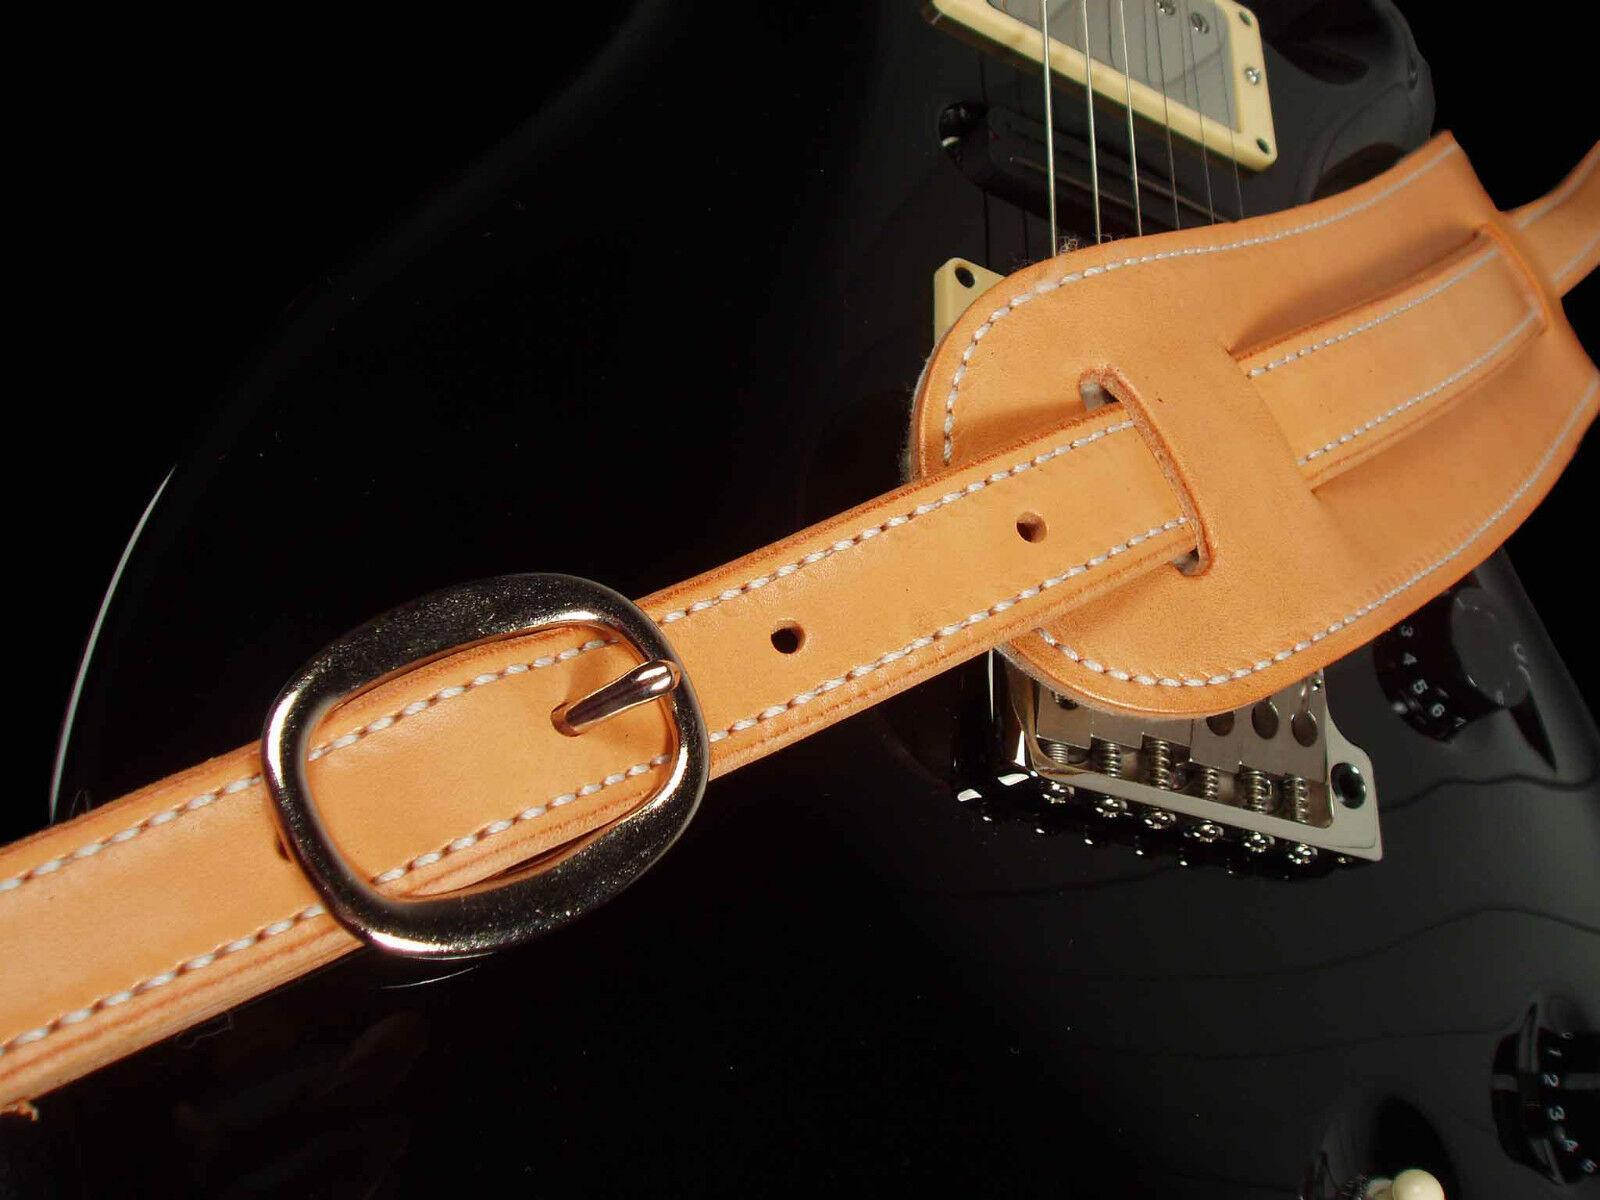 2018 EL DORADO LEATHER GUITAR STRAP - CLASSIC - braun, schwarz OR TAN - NEW